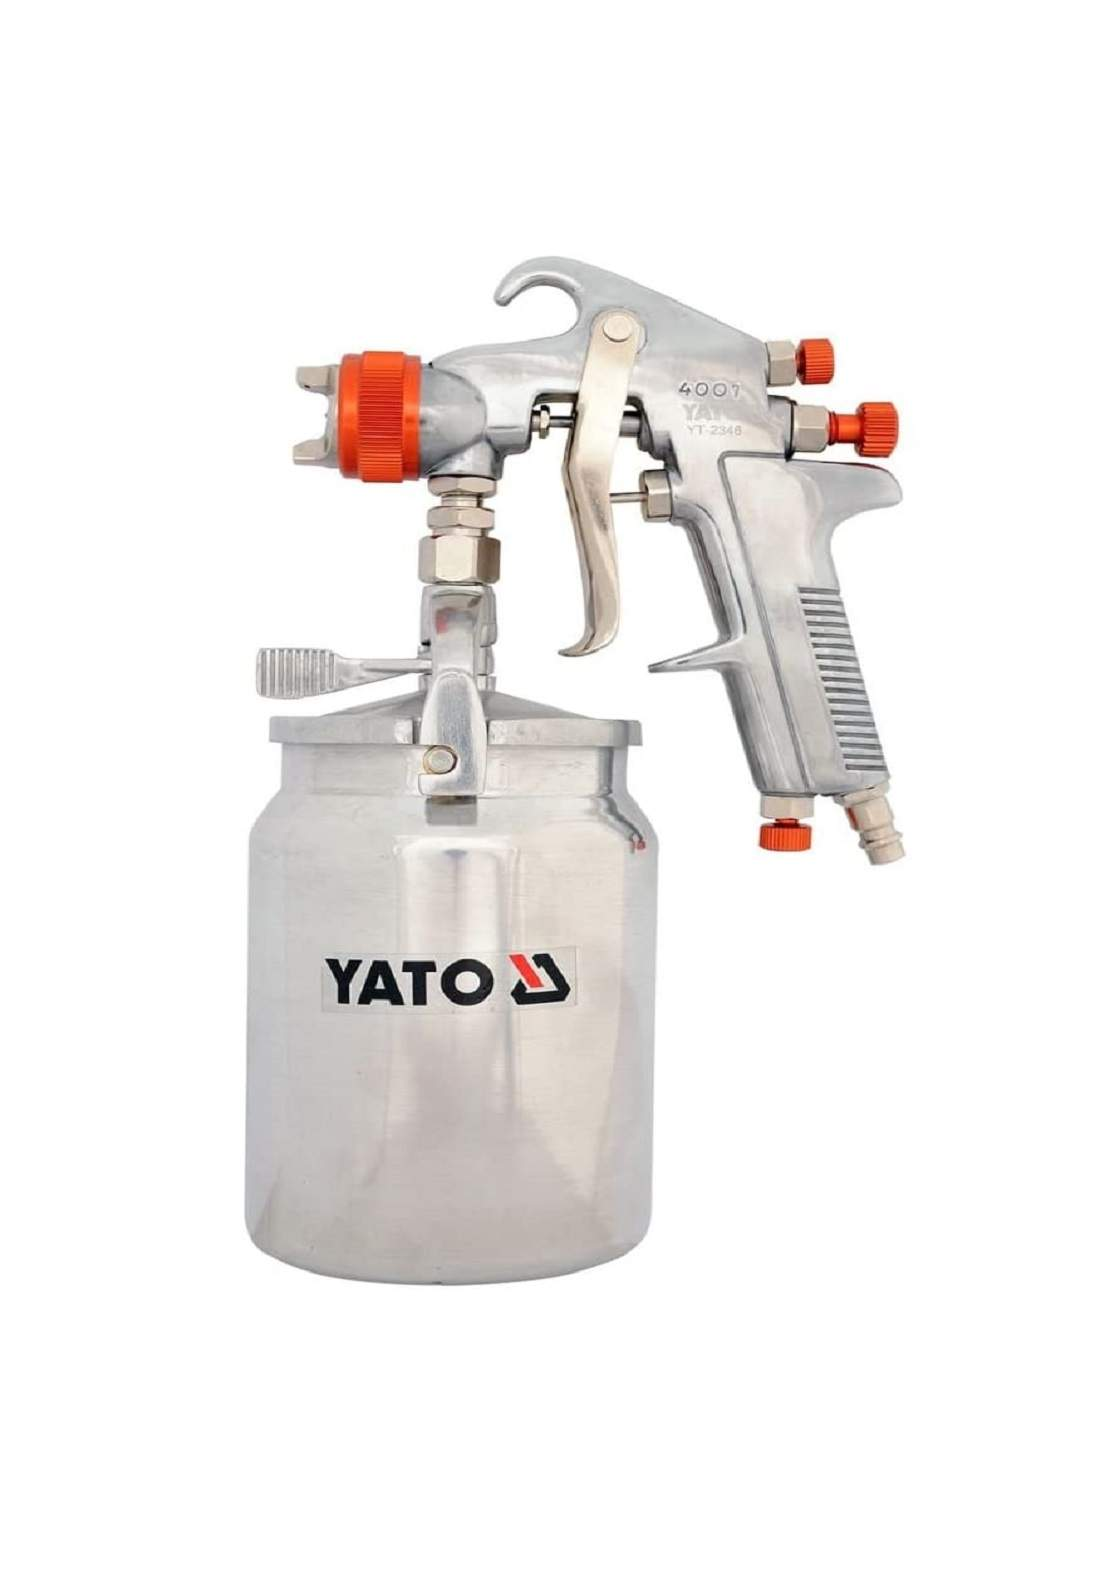 Yato YT-2346 Hvlp spray gun 0.6l, 1.8 mm مسدس طلاء